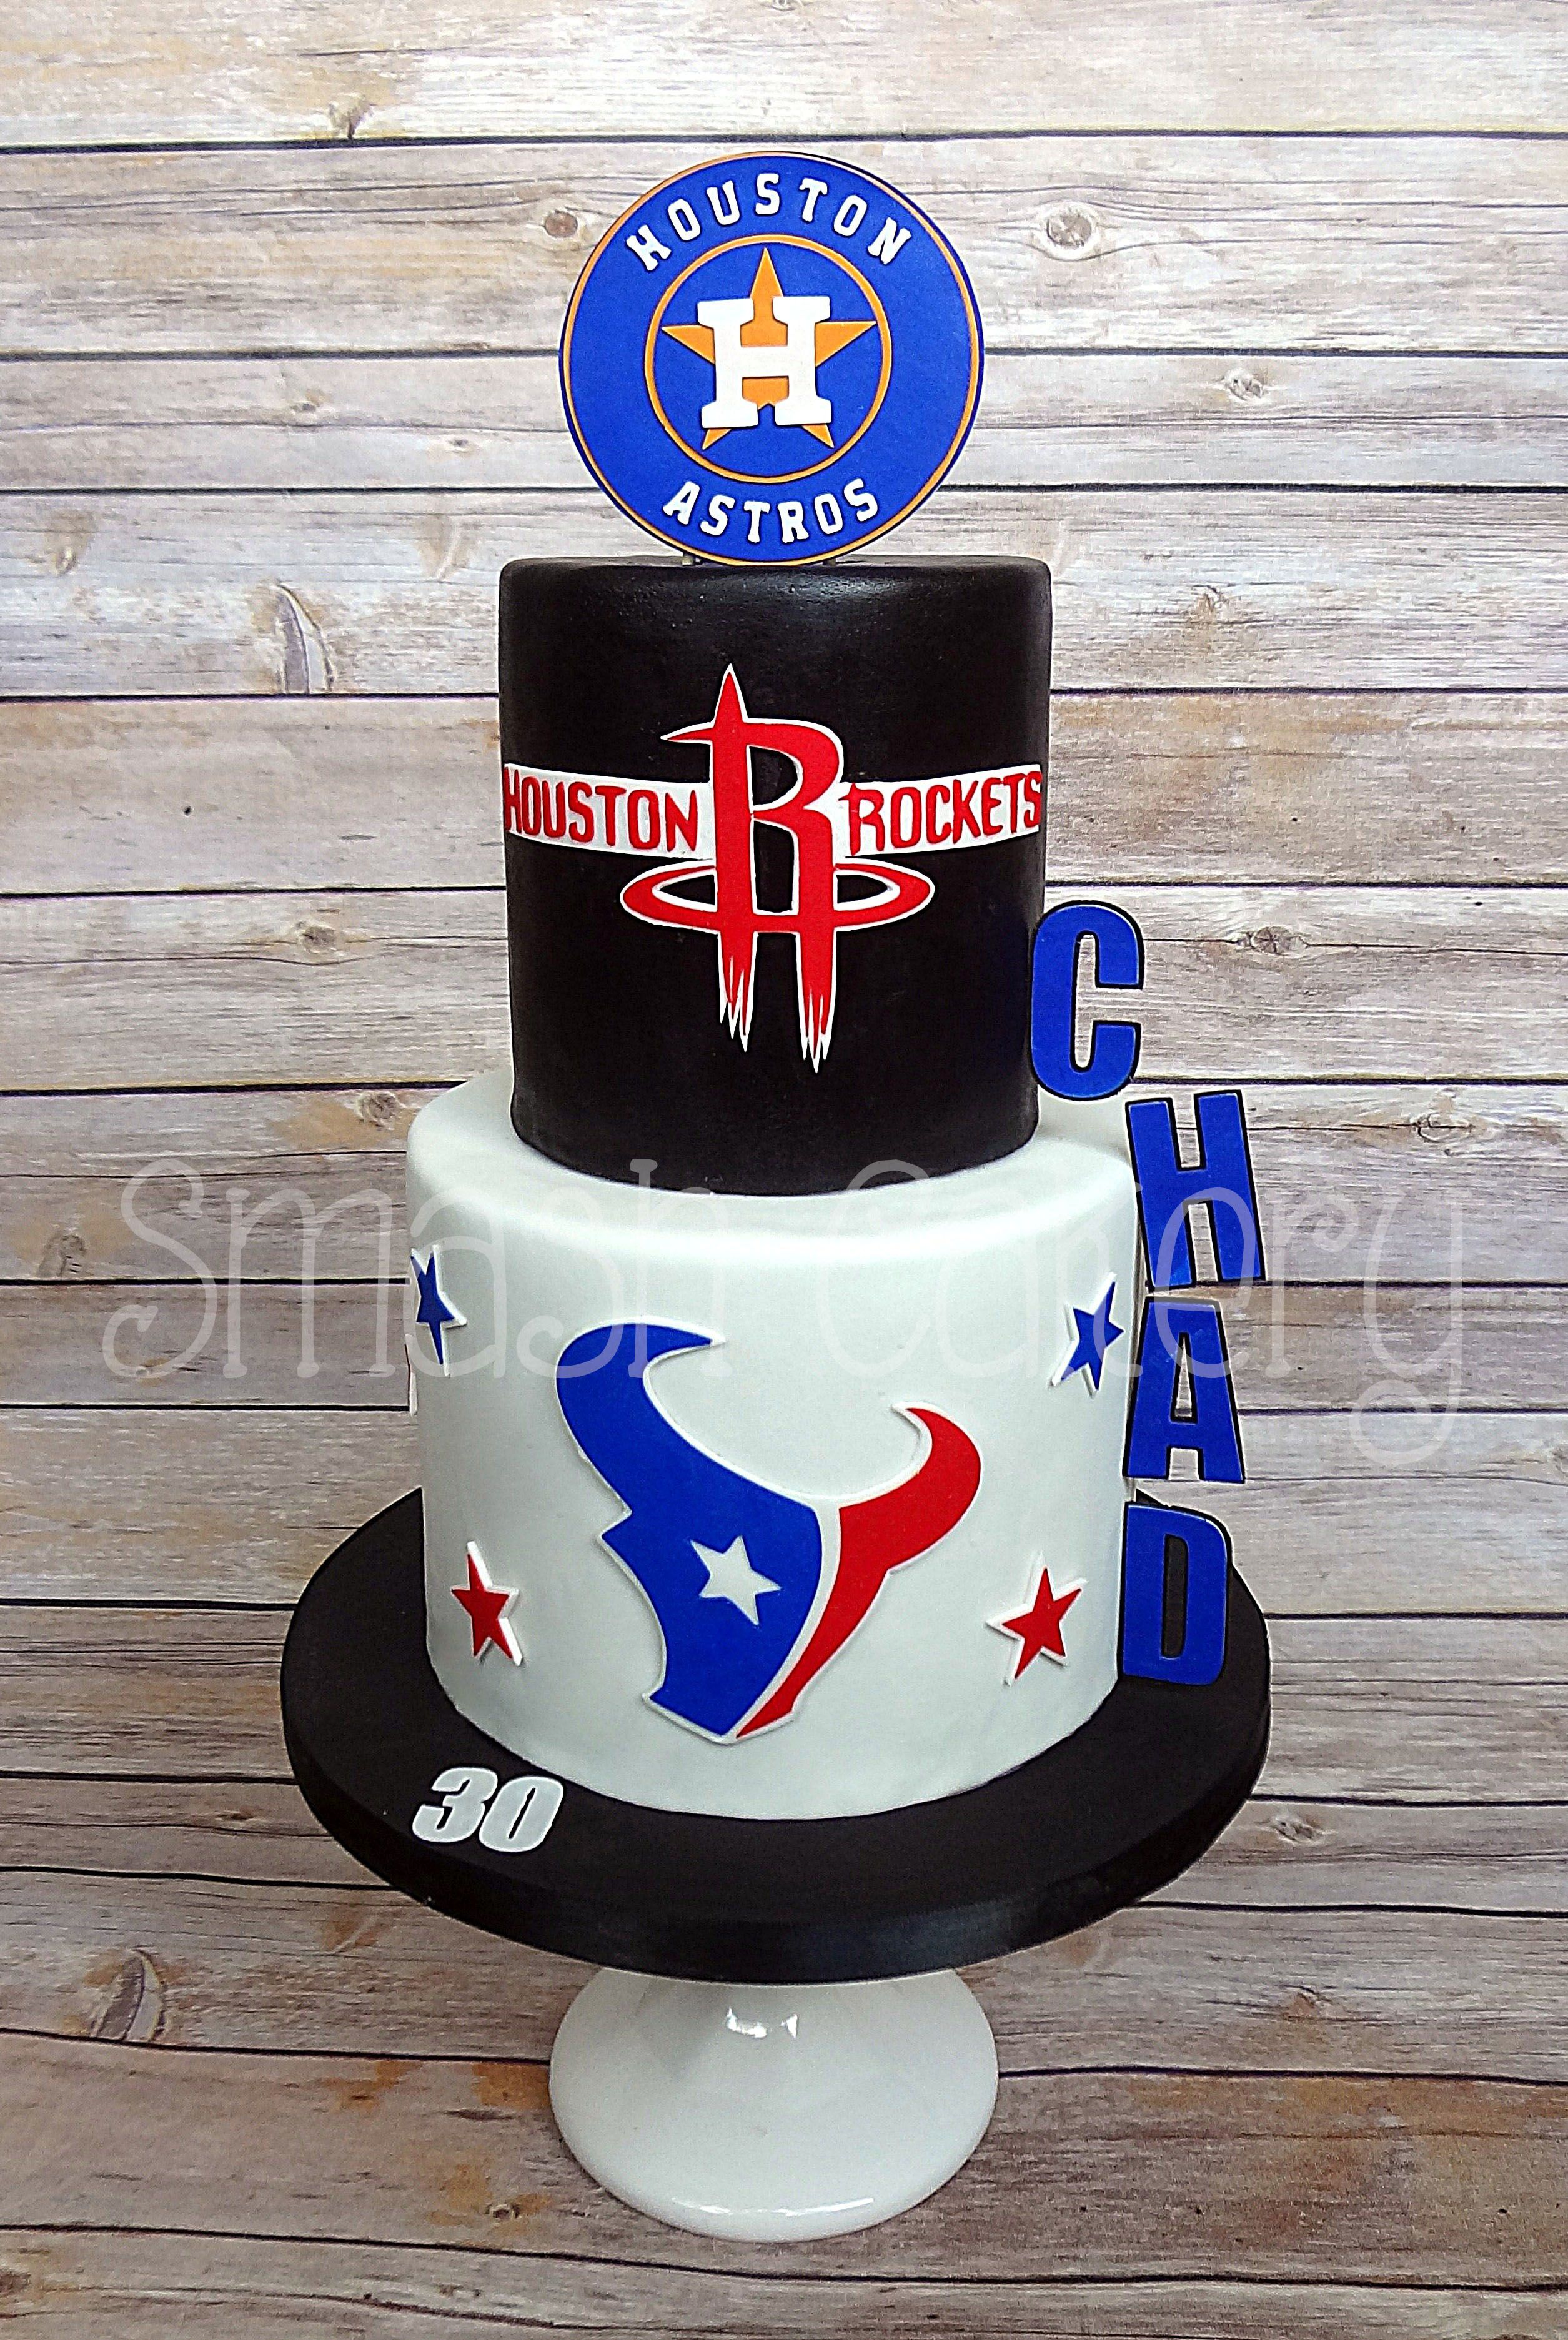 Houston astros rockets and texans themed fondant cake